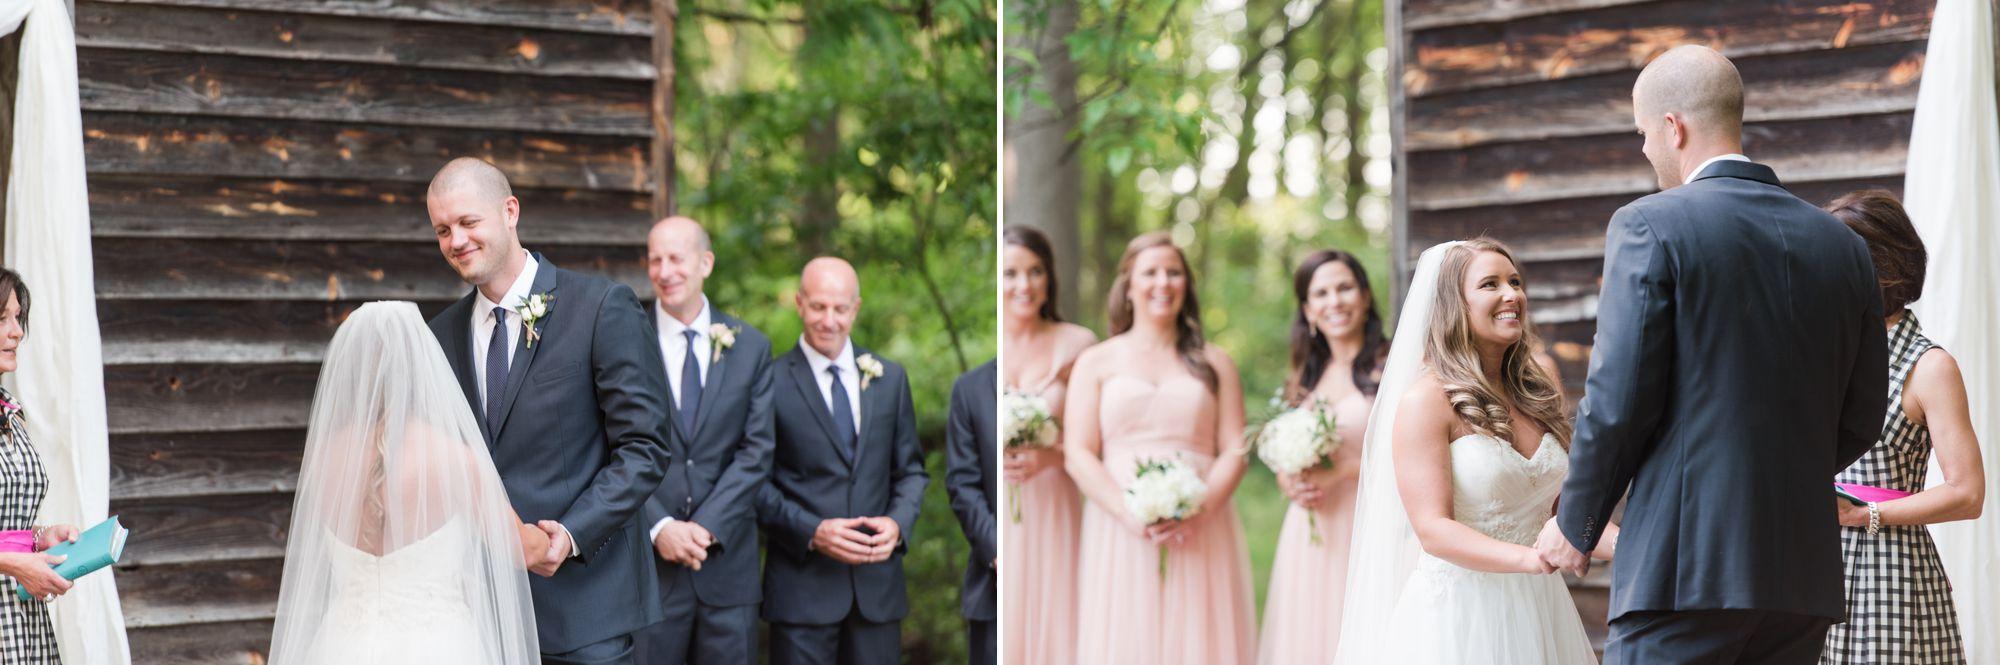 beaver-dam-house-davidson-nc-wedding-photos 57